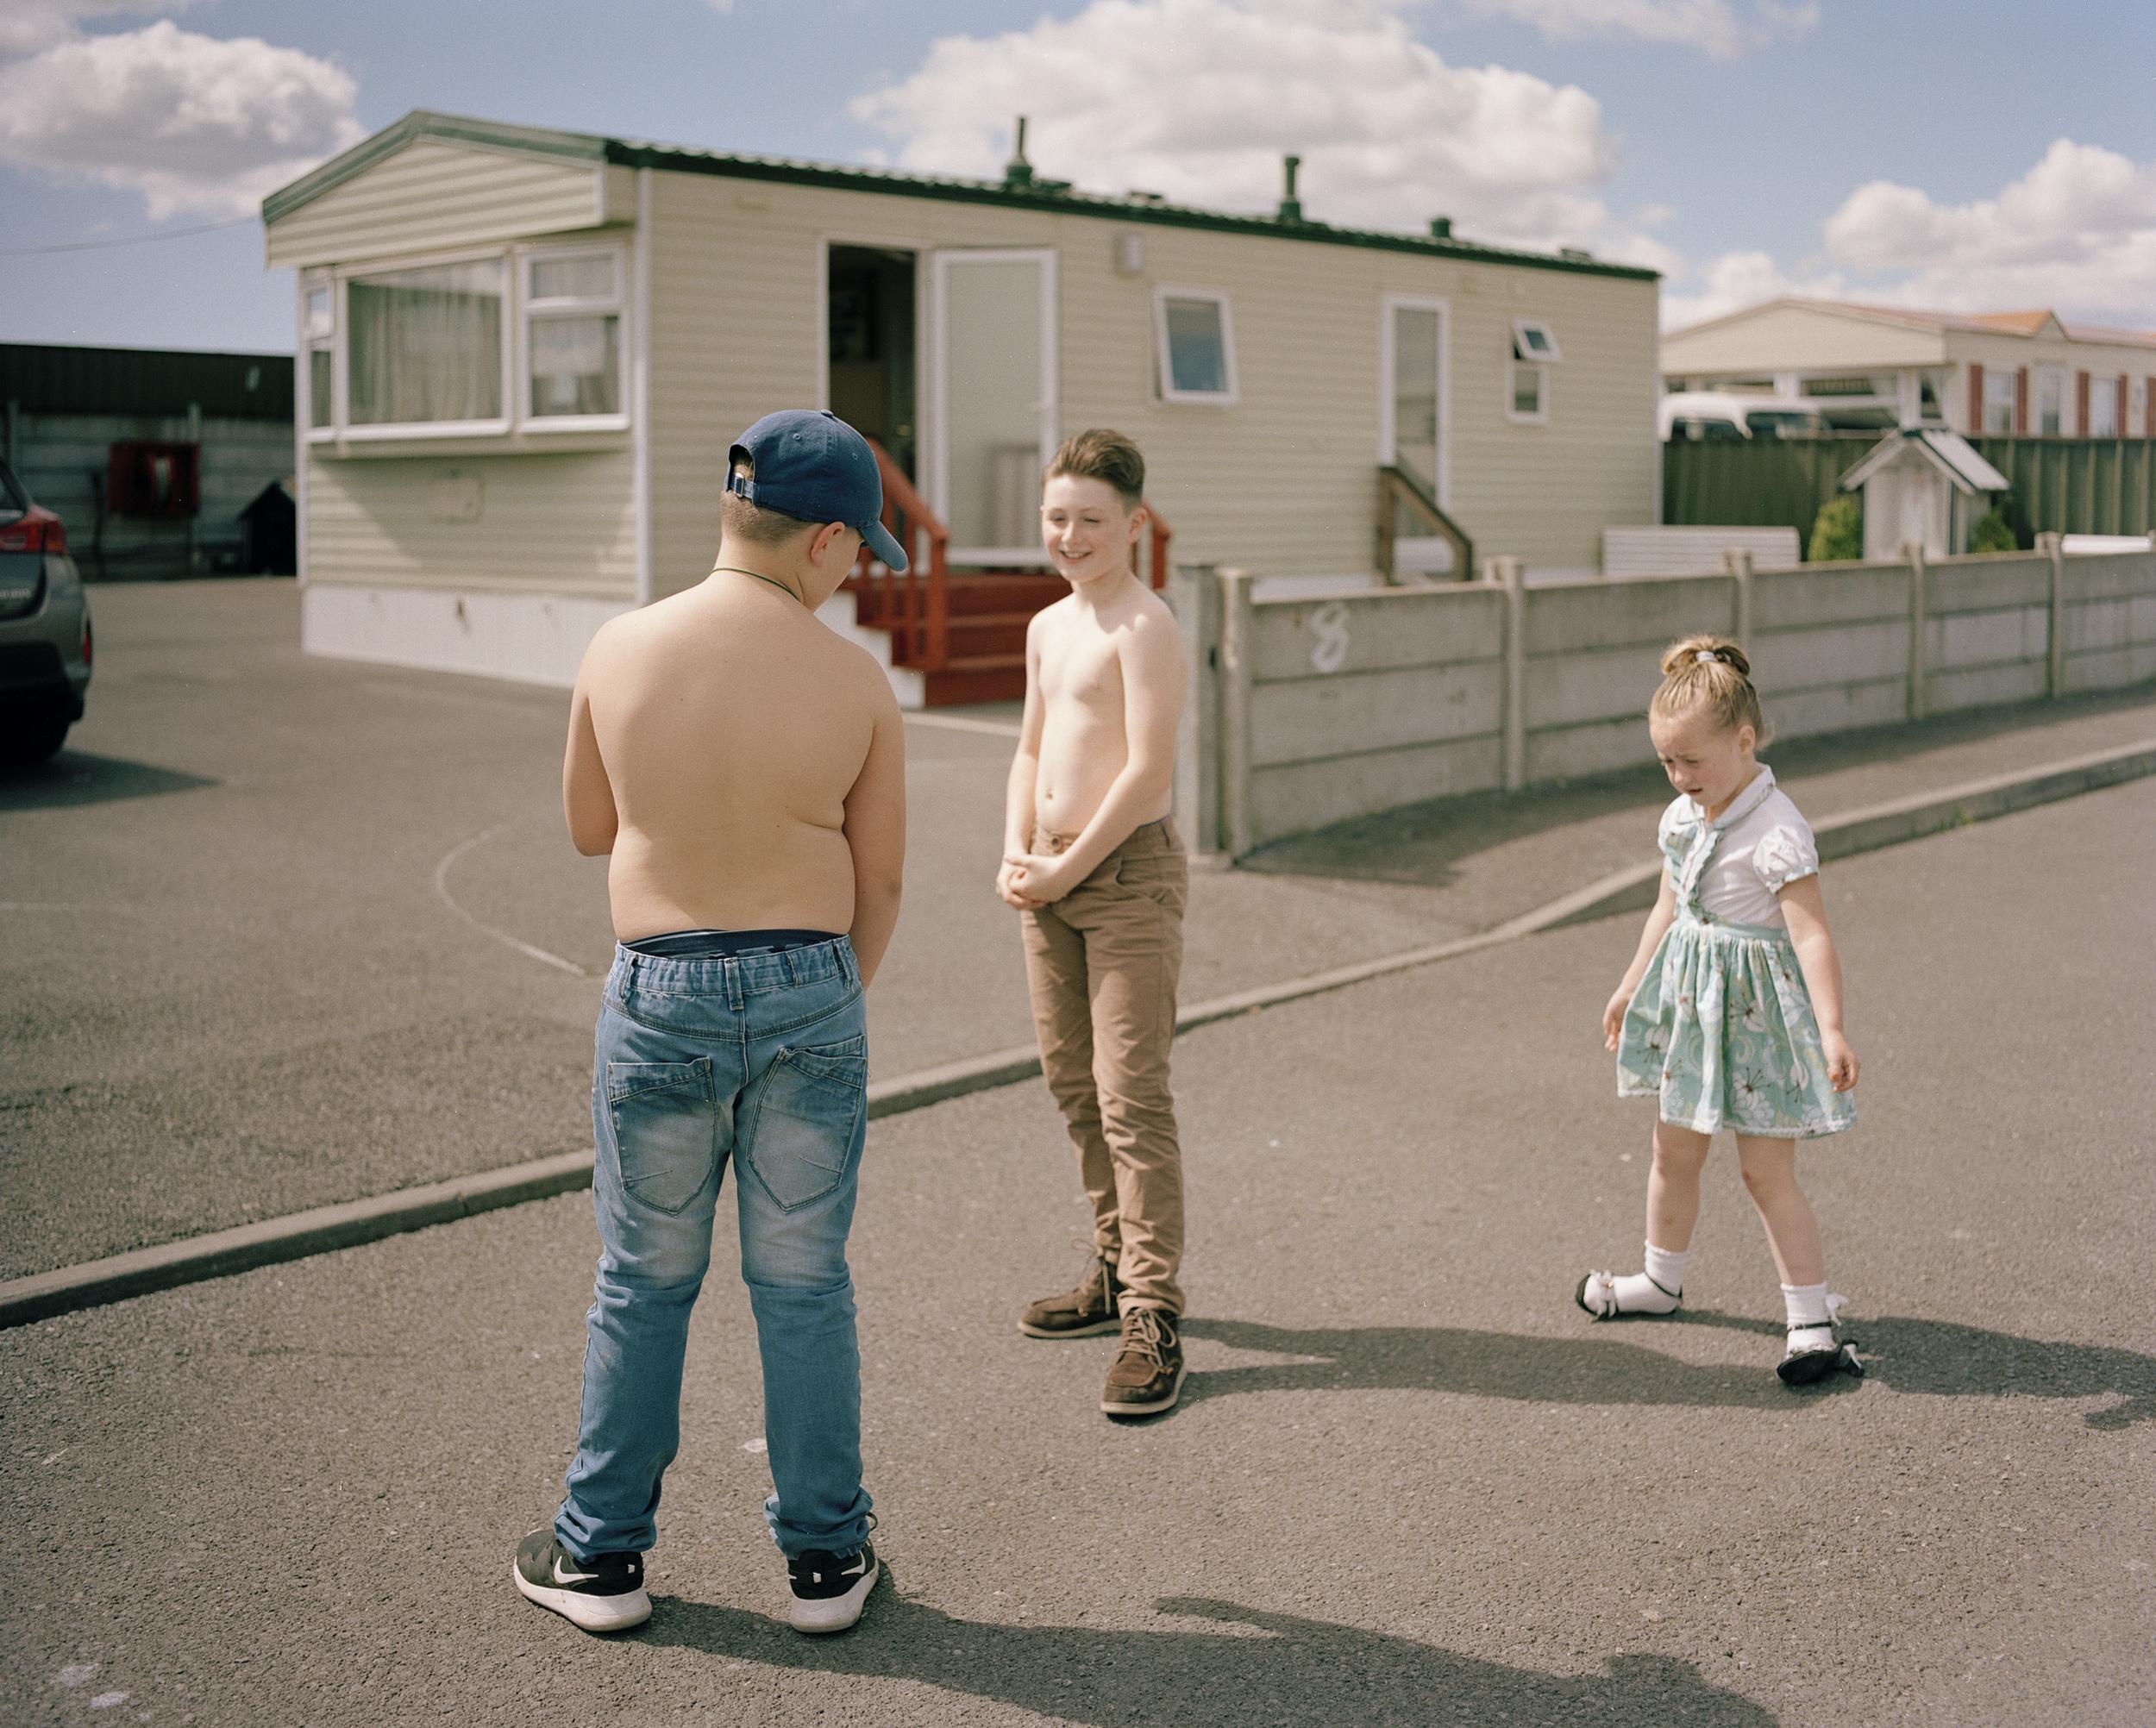 Tamara_Eckhardt_The_Children_of_Carrowbrowne_9